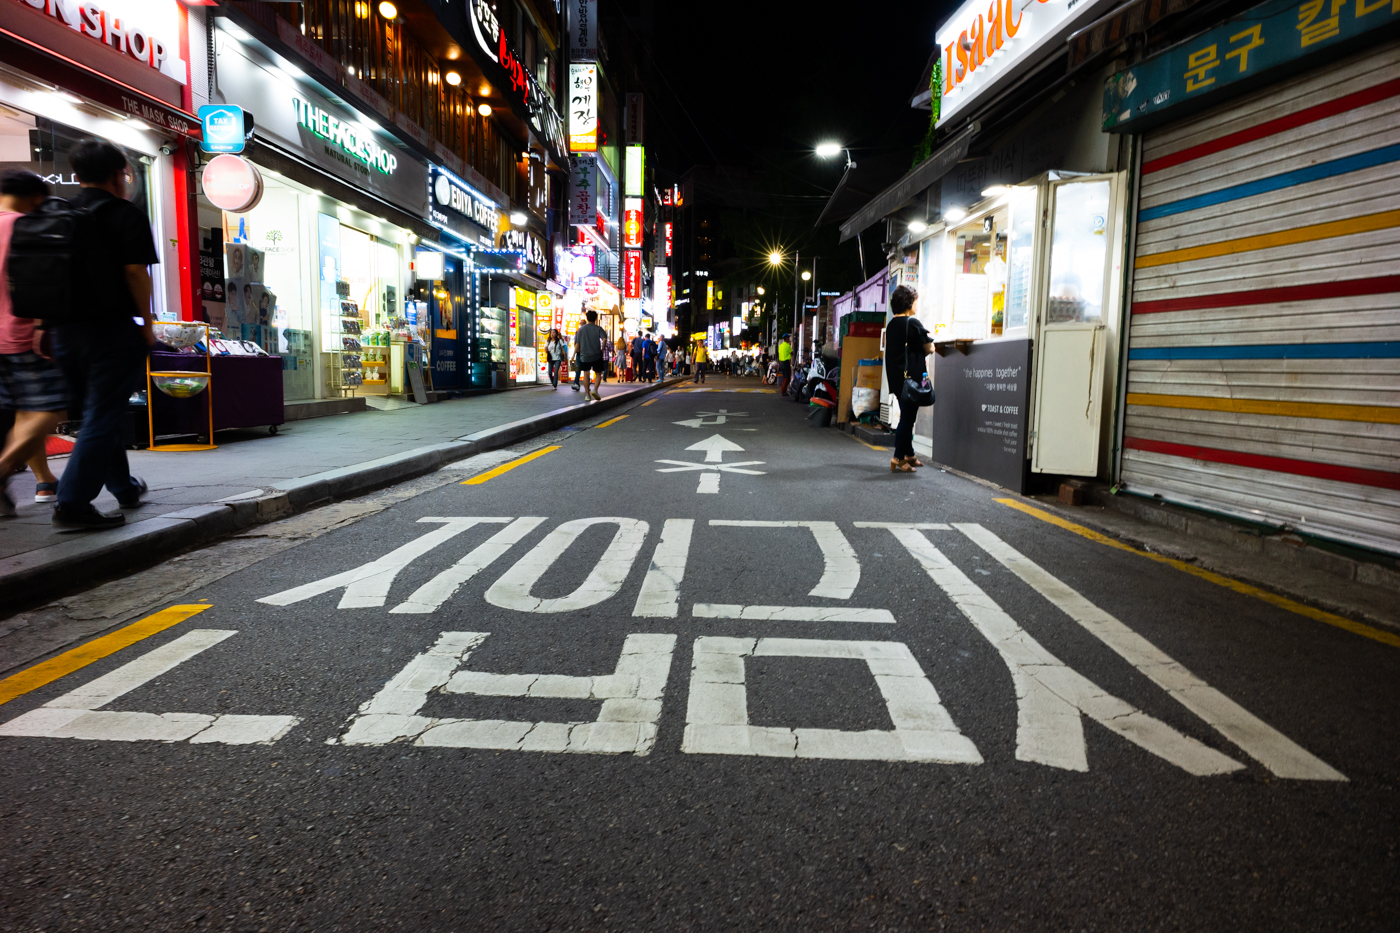 SoKo Seoul, South Korea Leica SL 21mm f/3.4 Super Elmar © Keith R. Sbiral, 2018